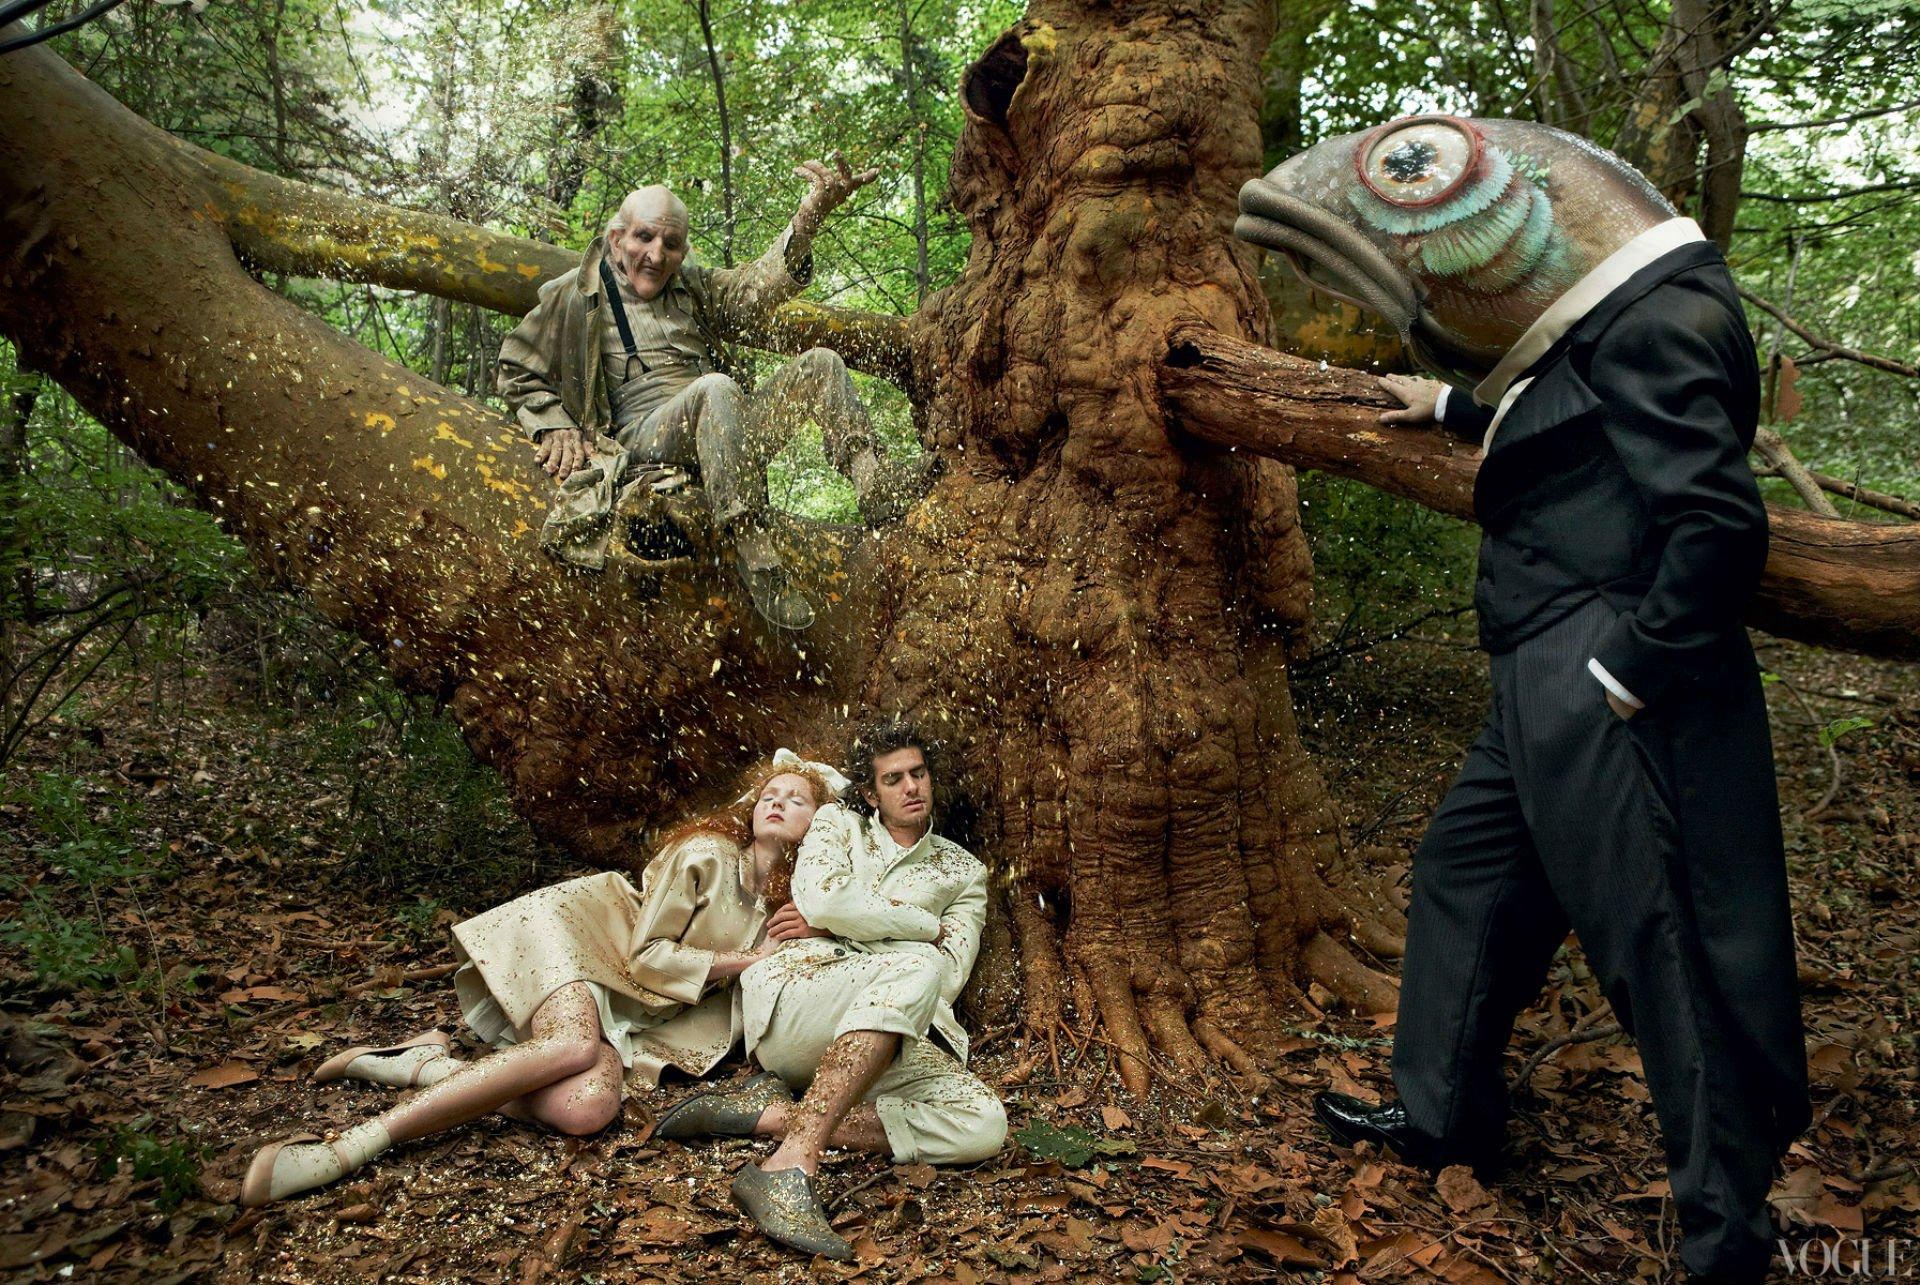 DISNEY DREAM Annie Leibovitz series fantasy cosplay fairy tale 1ddp advertisement dreams actor ...